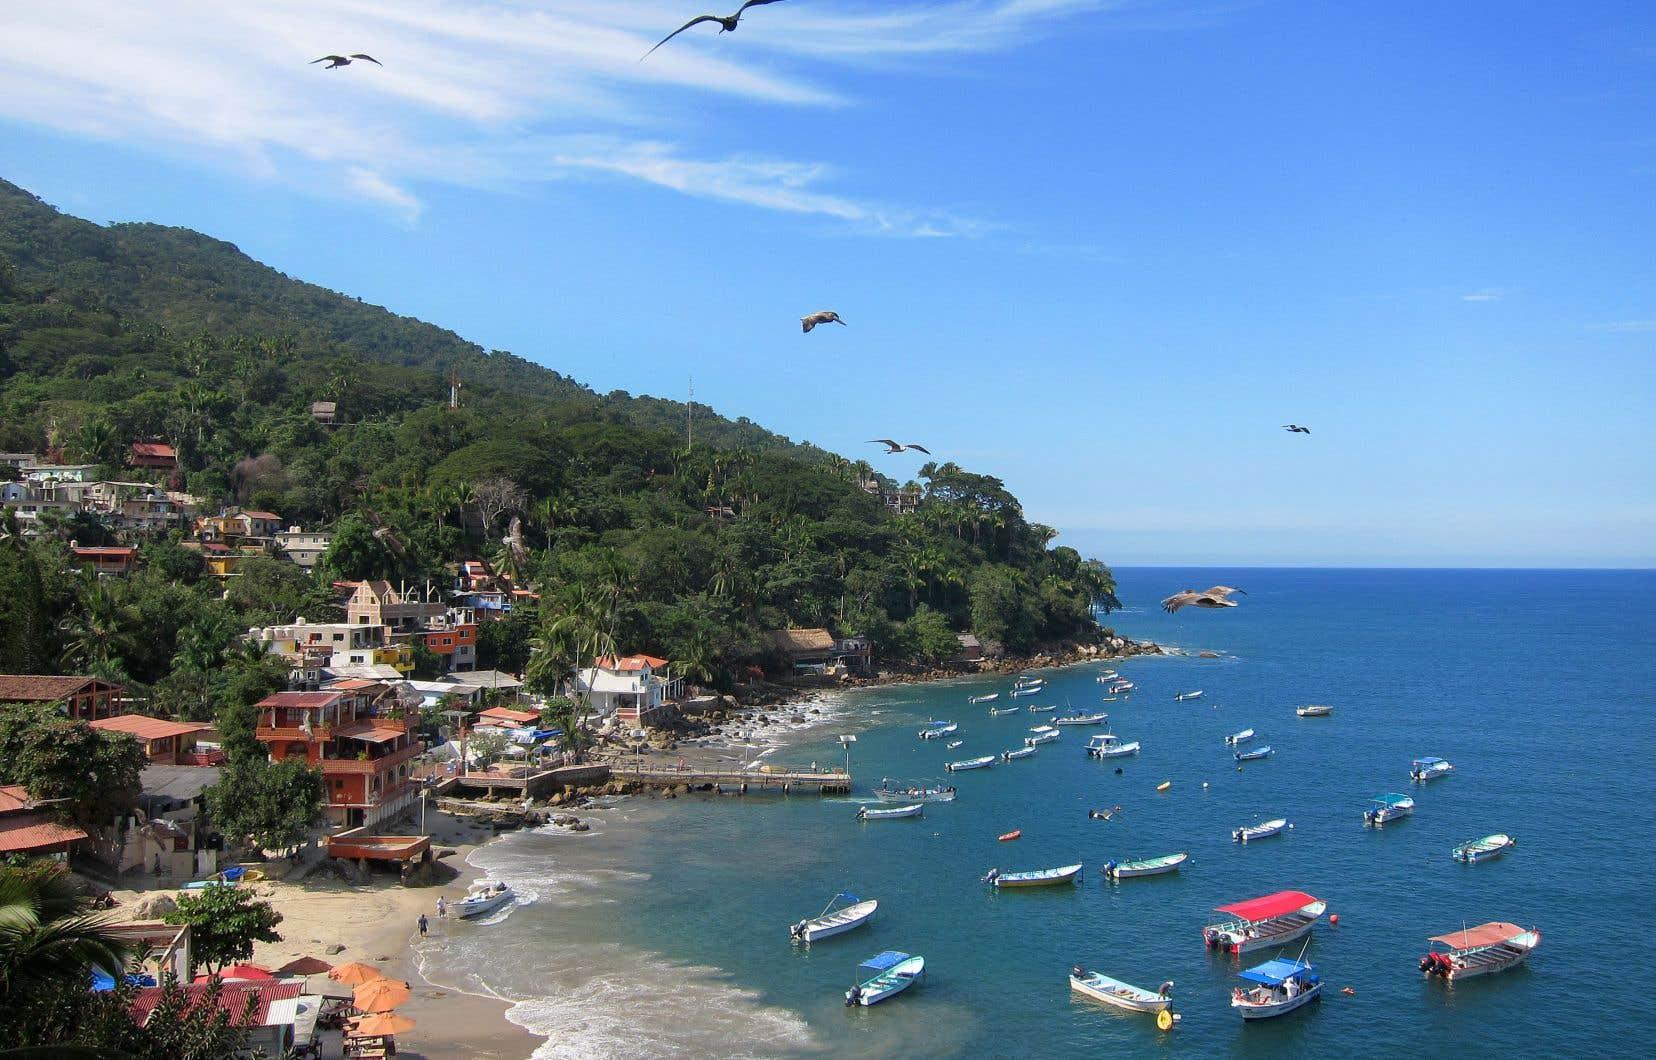 La baie de Yelapa côté village